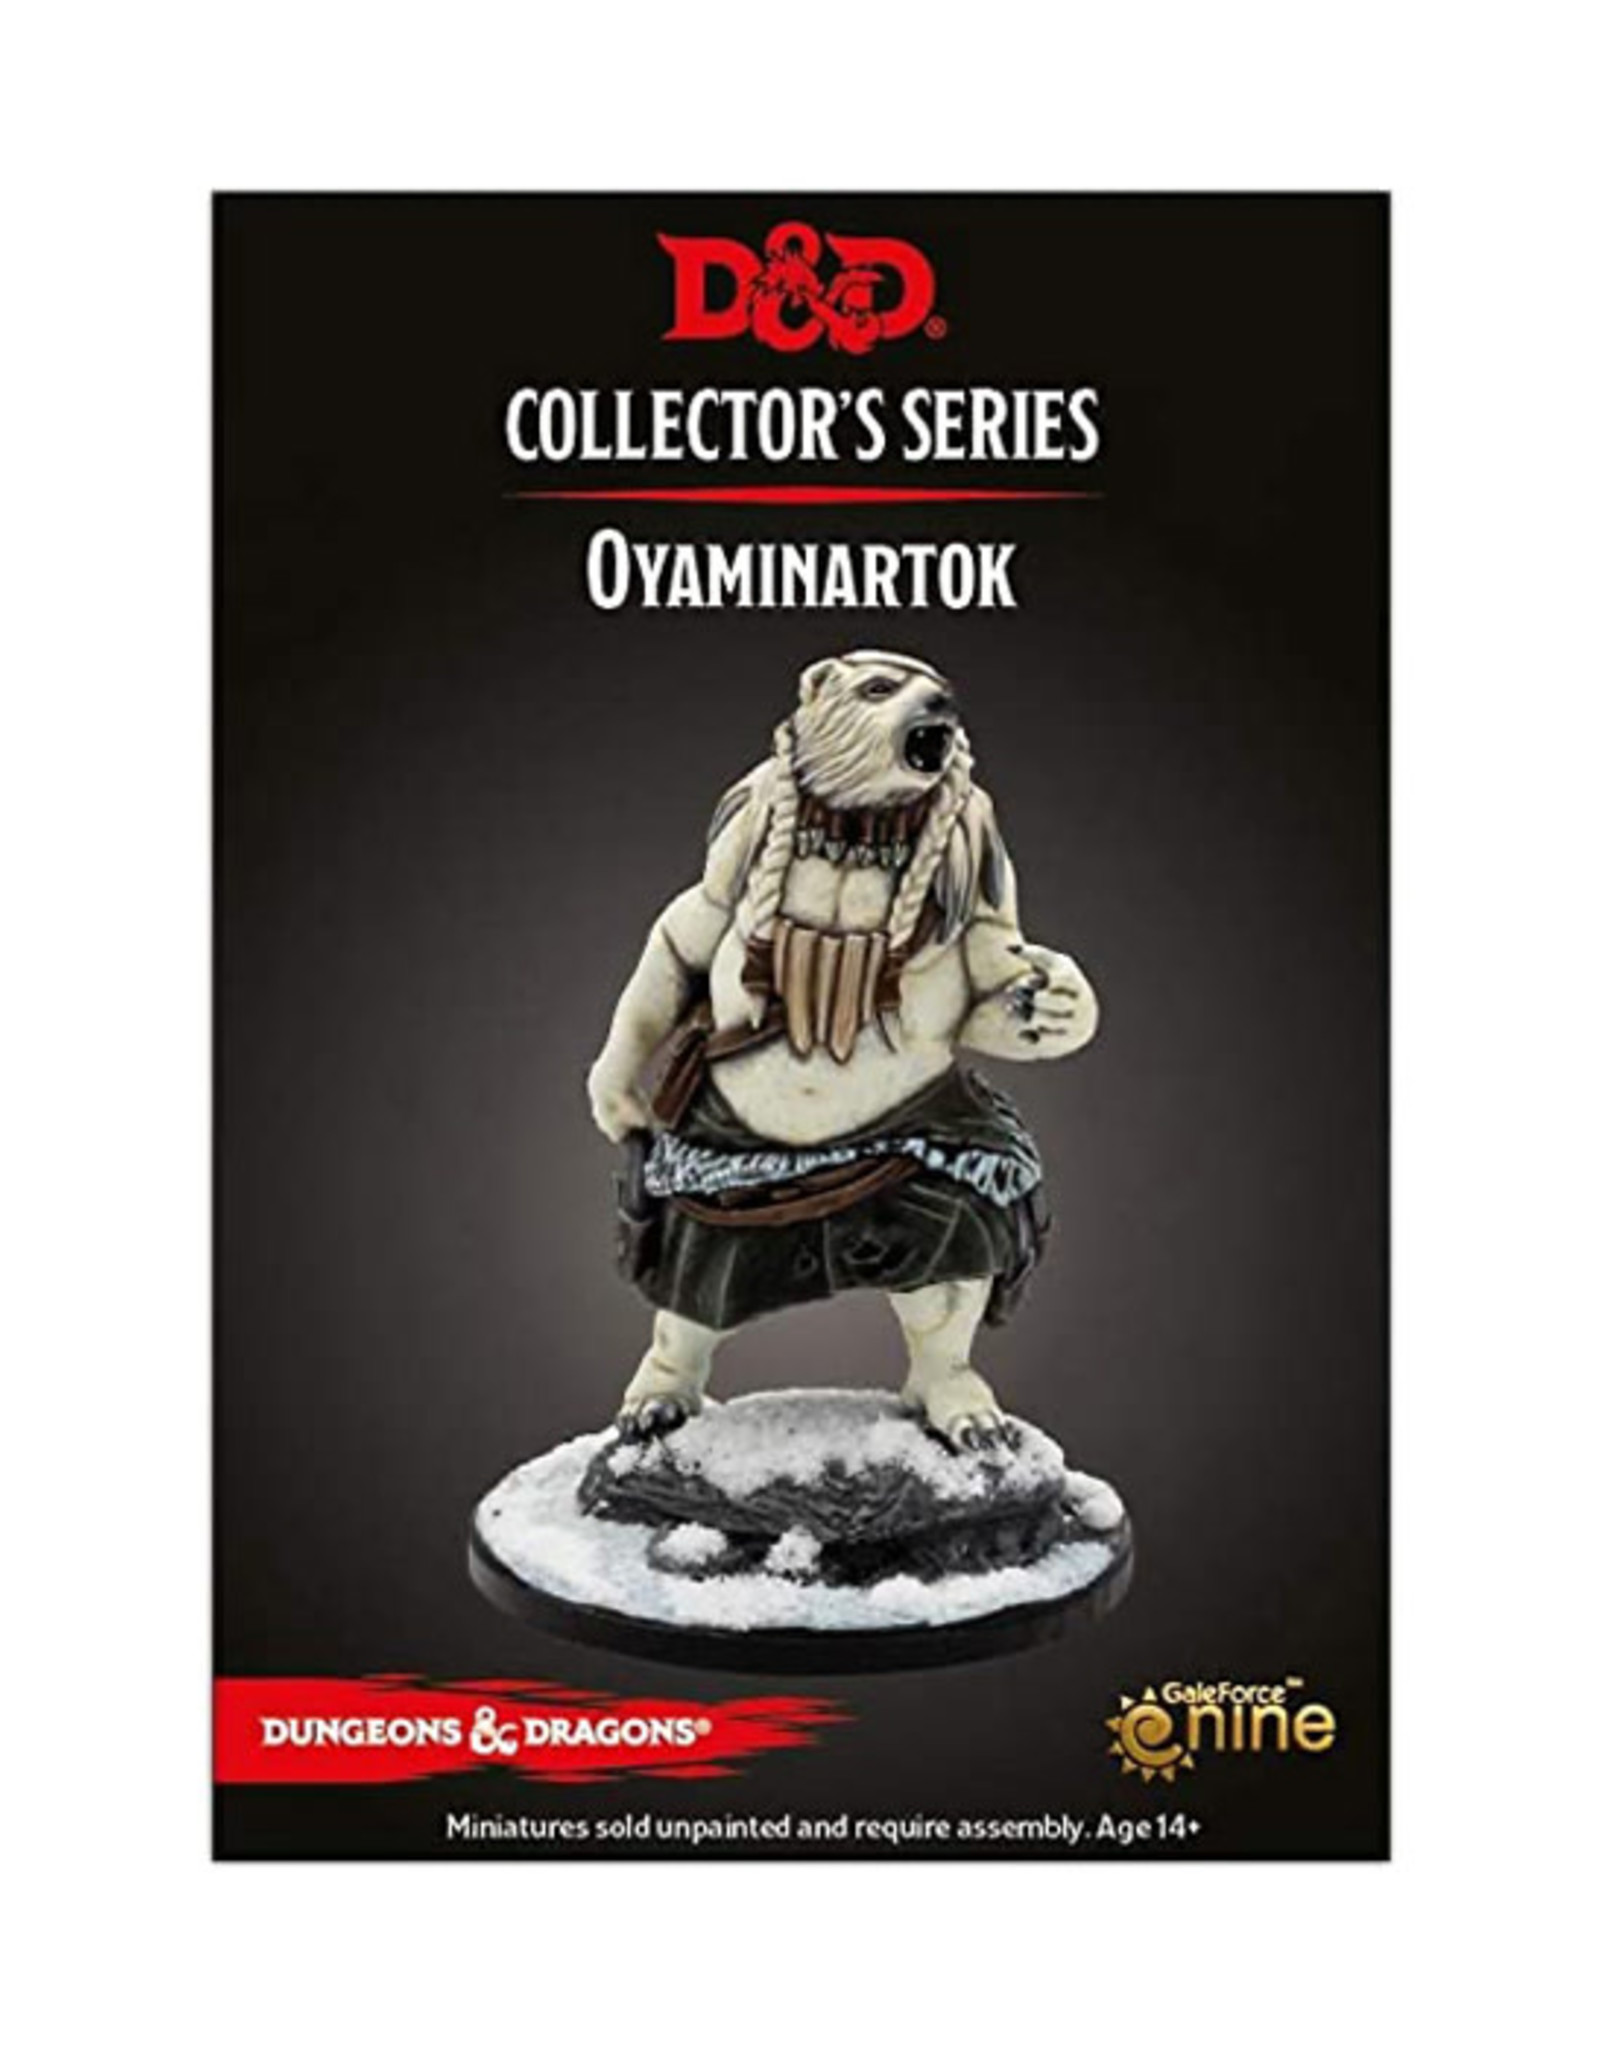 Dungeons & Dragons Dungeons & Dragons: Collector's Series - Oyaminartok